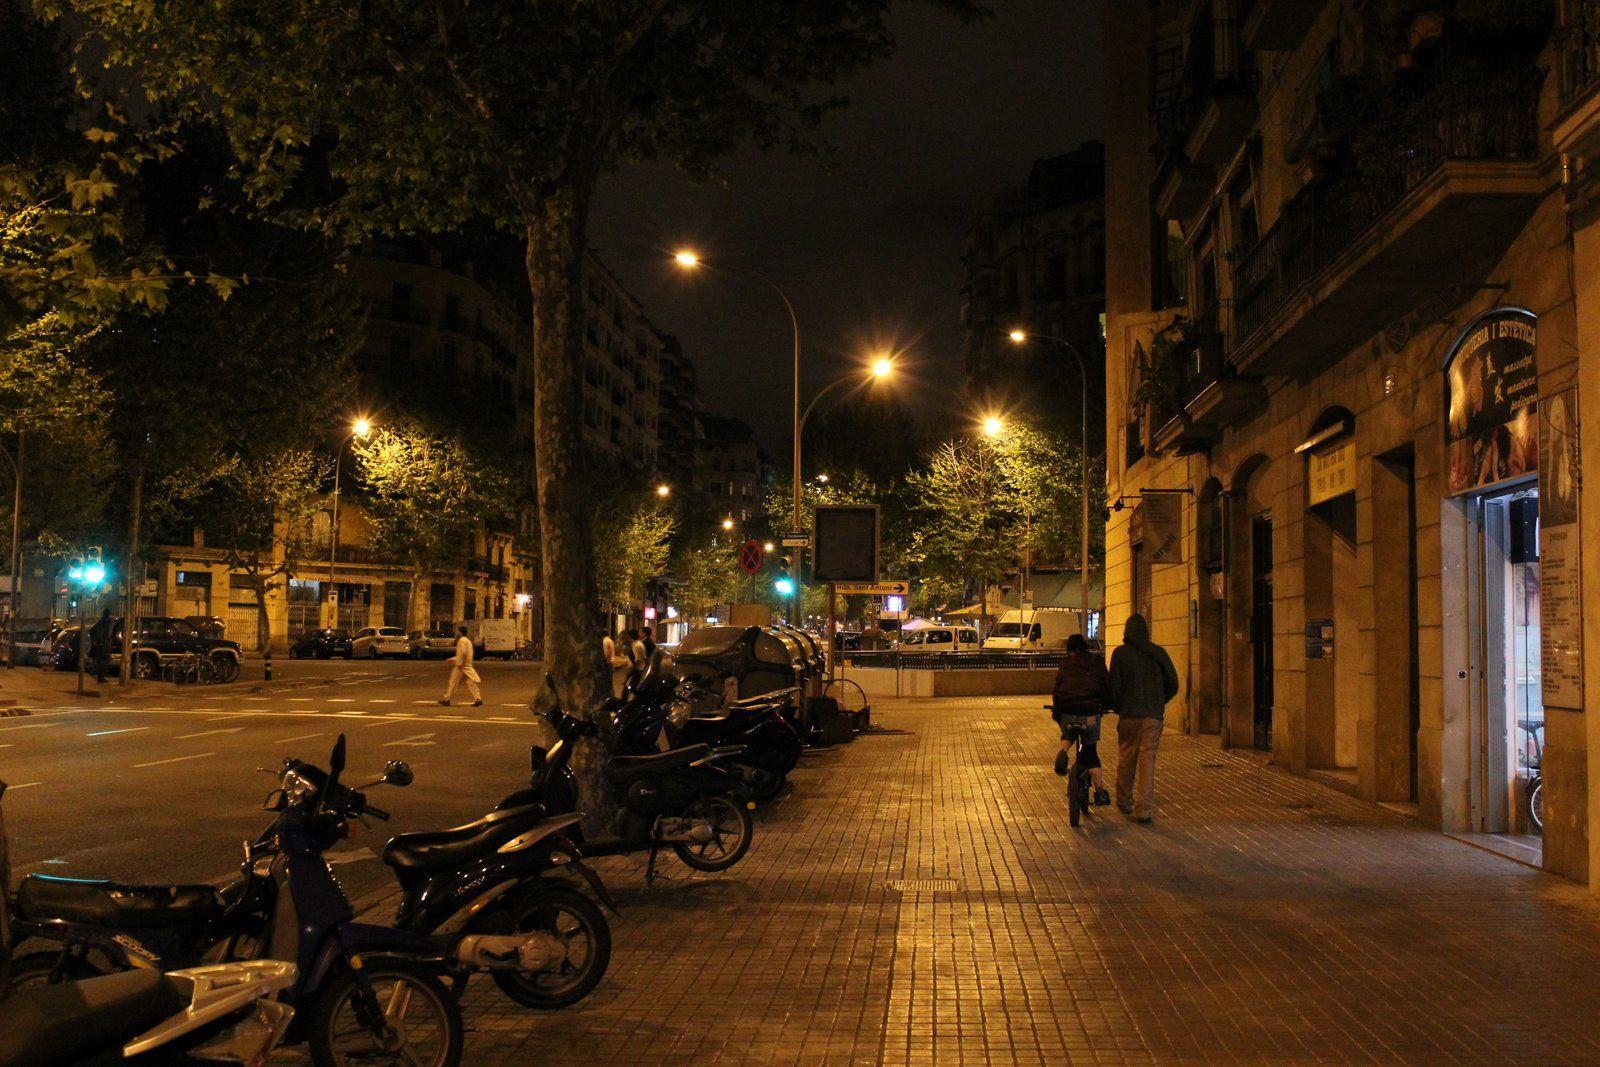 Barcelona City At Night   Ciudades